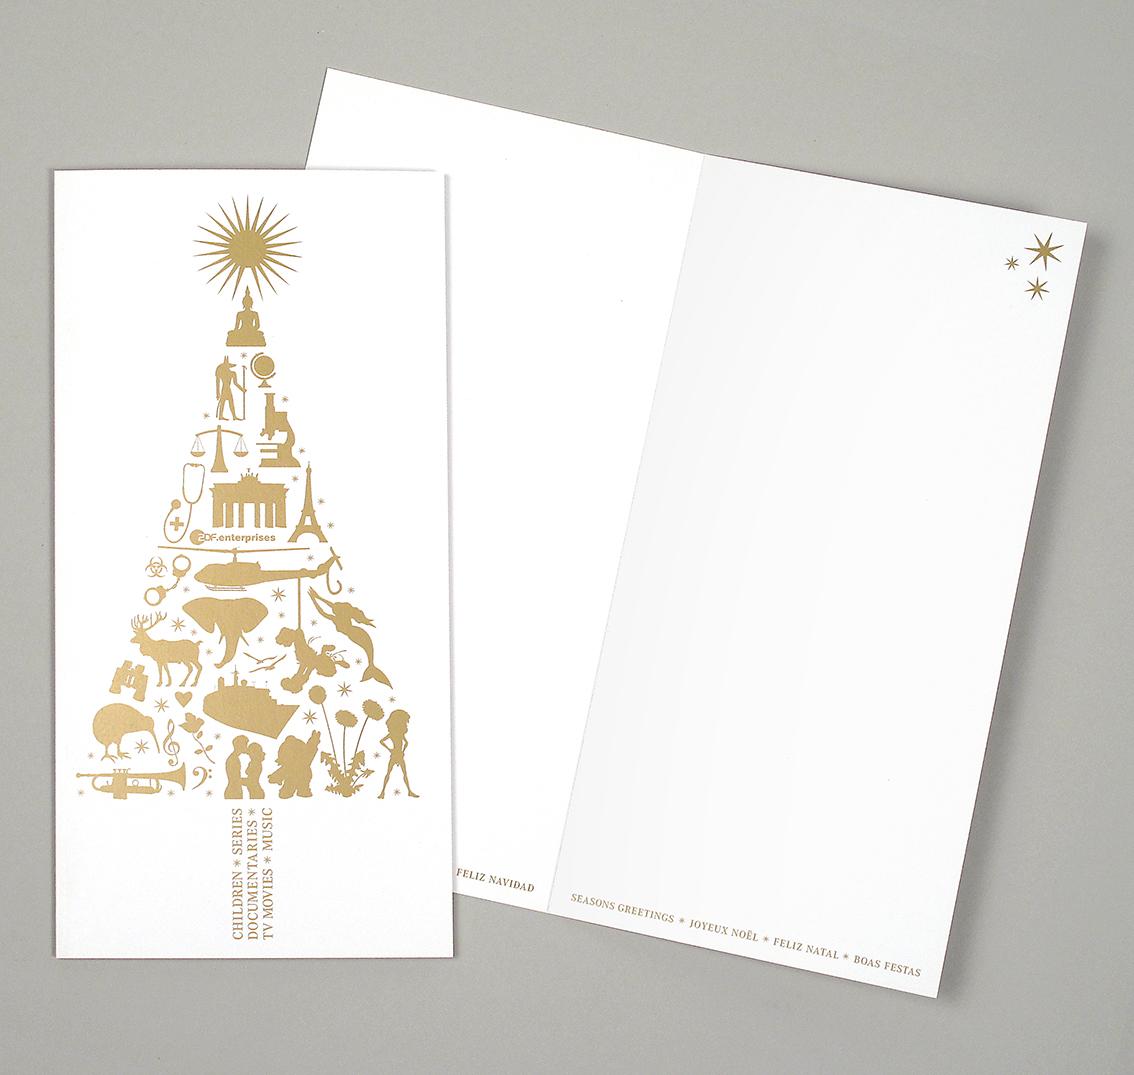 zdf_christmas_foto_2.jpg